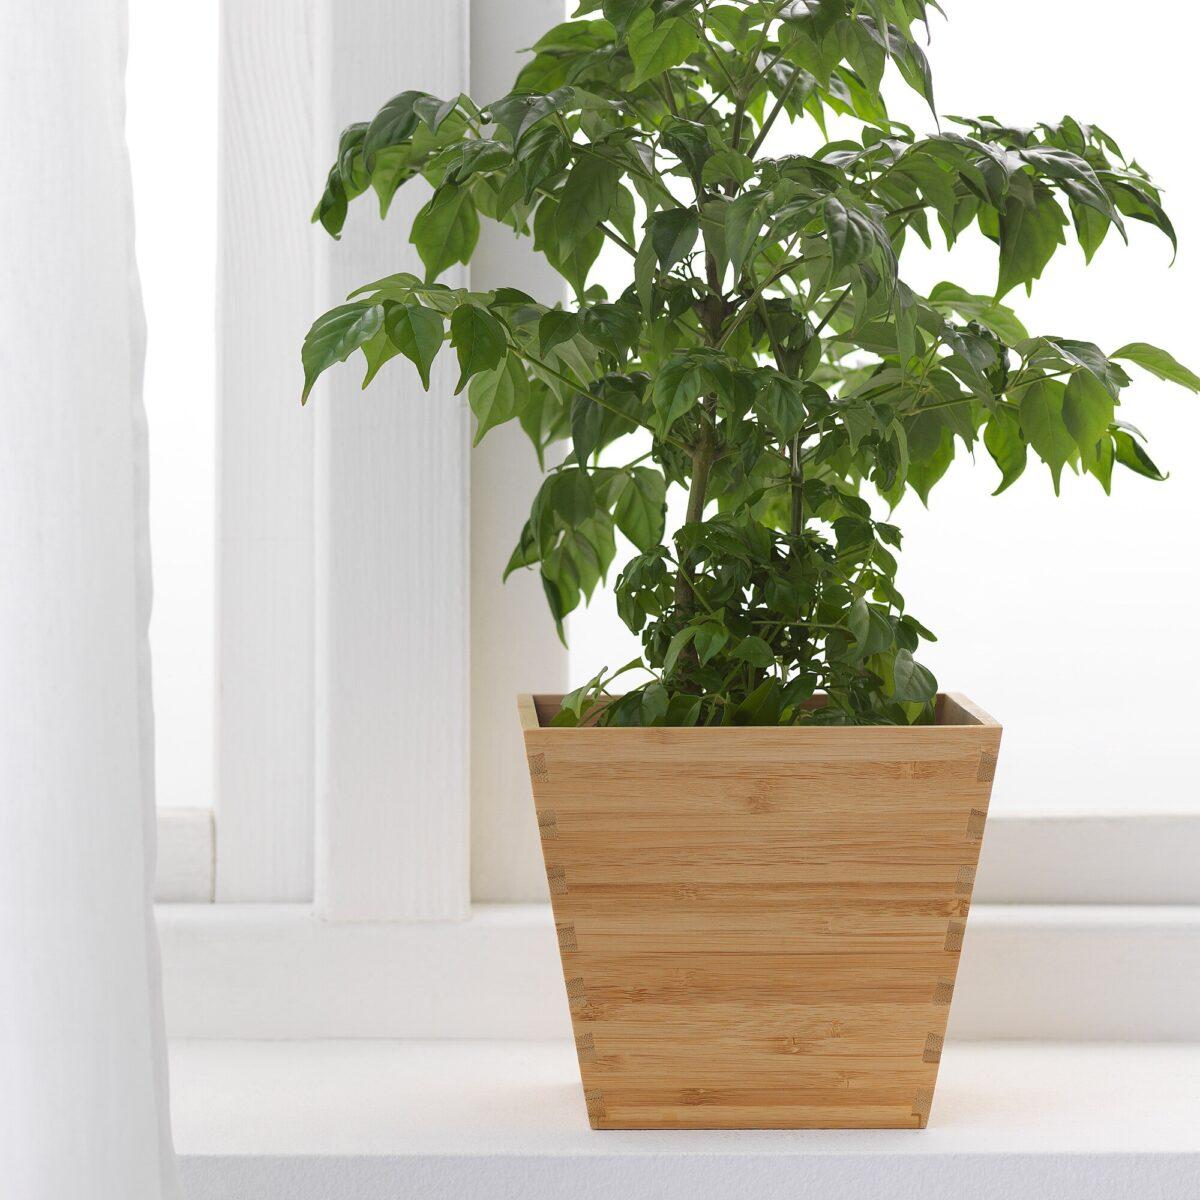 ikea-vildapel-portavasi-bambu